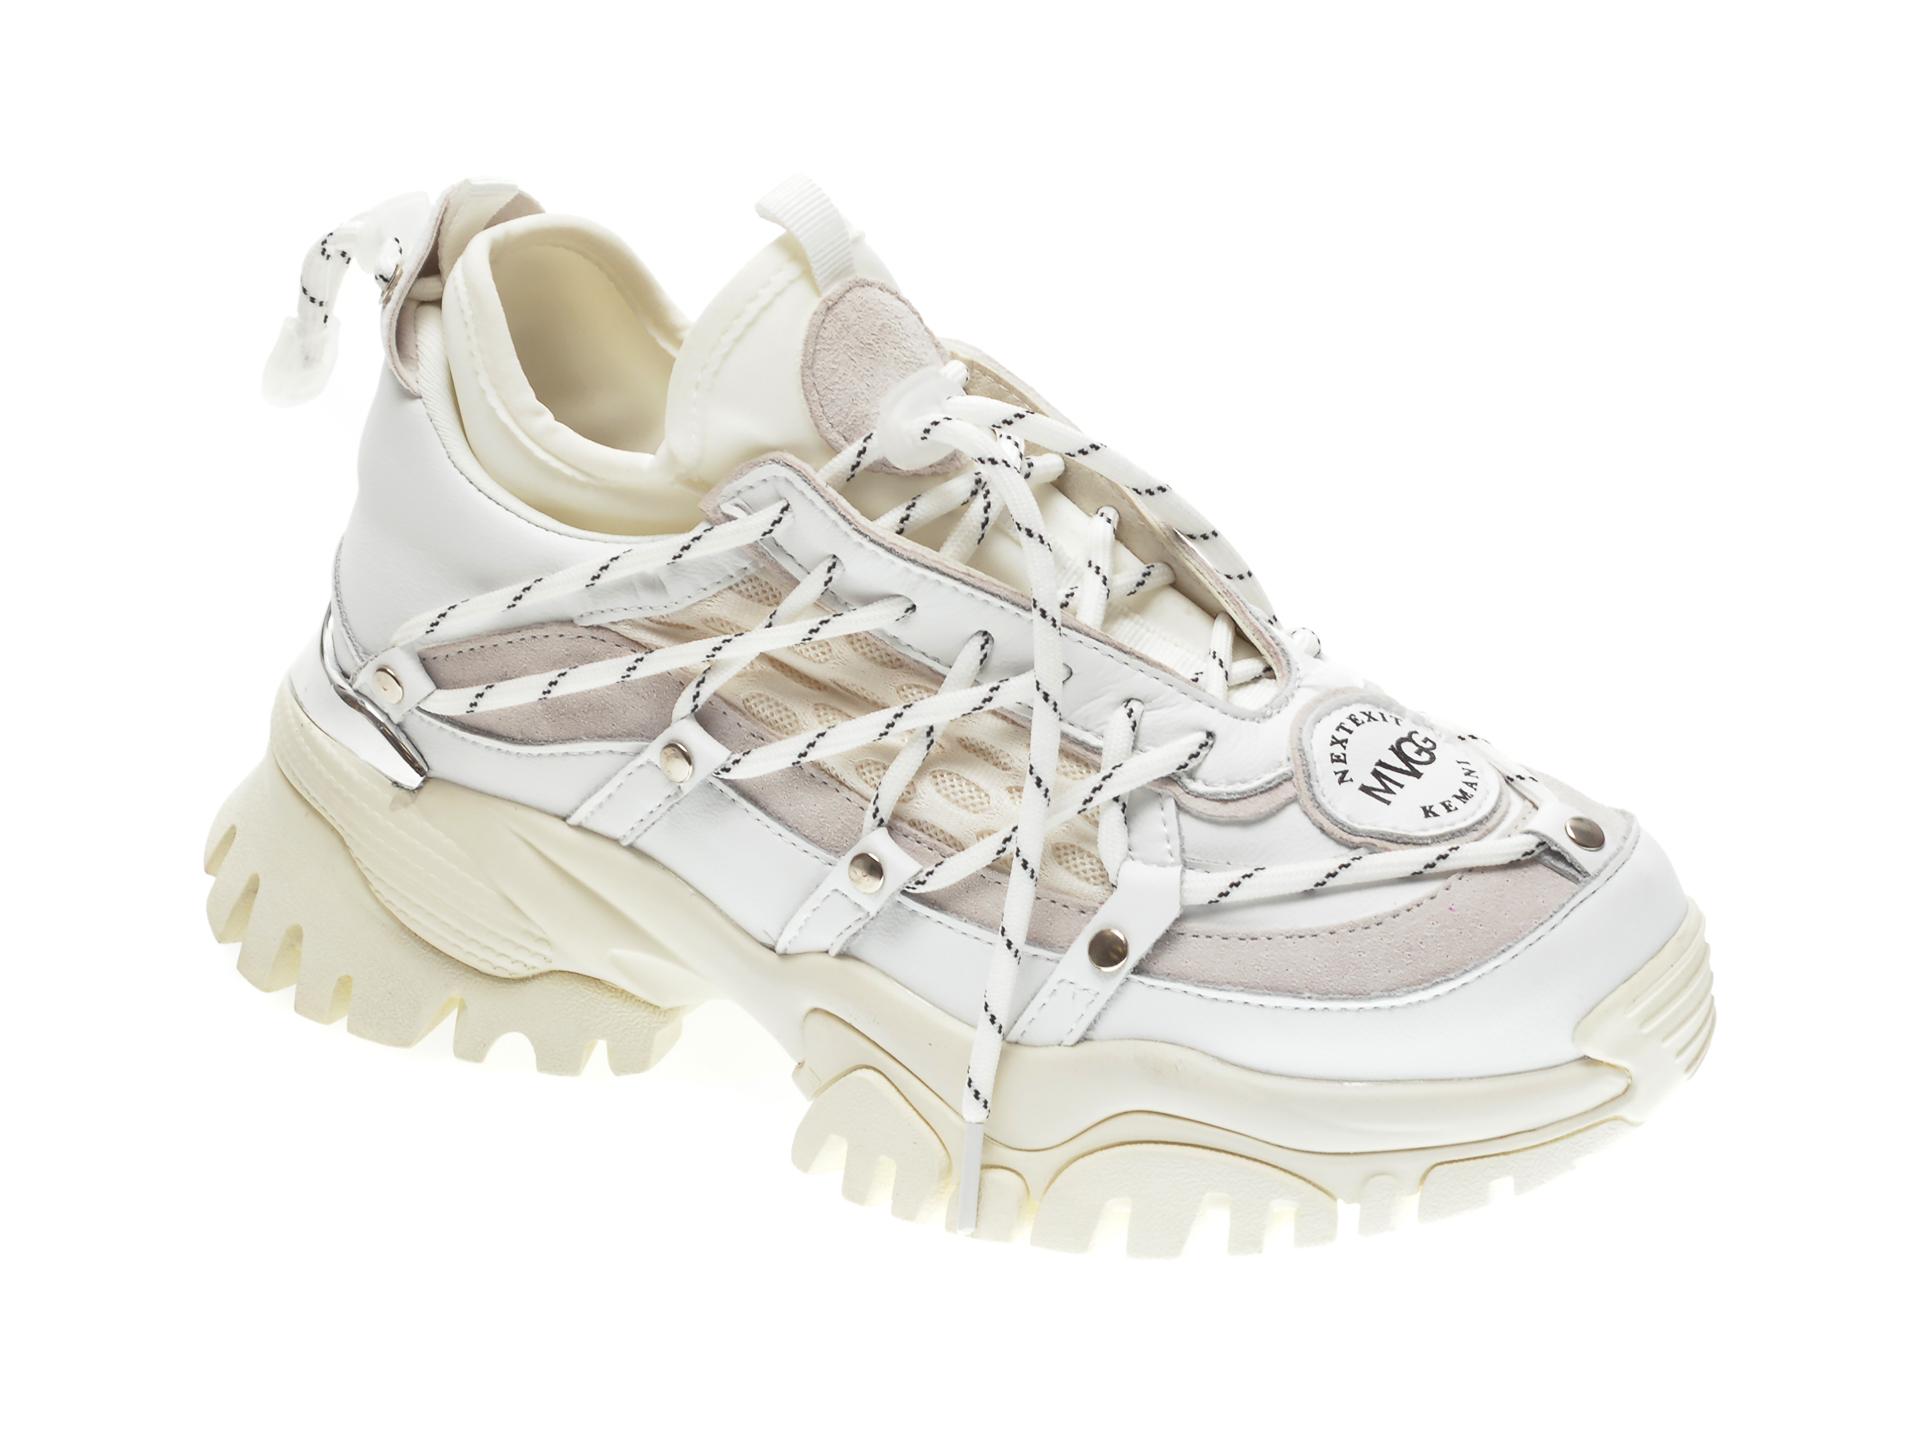 Pantofi sport GRYXX albi, 3511, din material textil si piele naturala